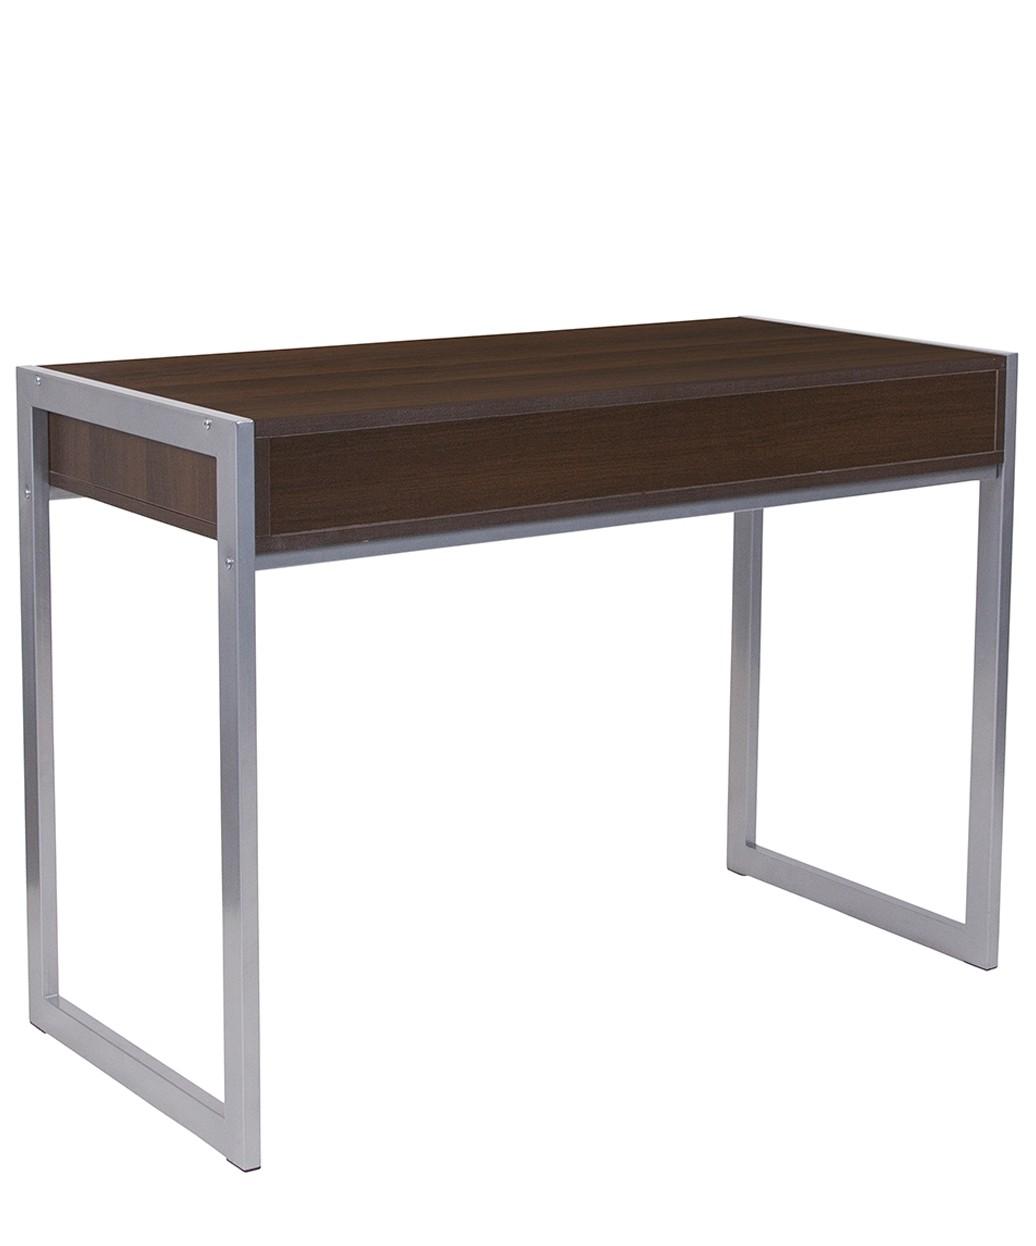 Flatiron Manicure Table w/ Metal Frame